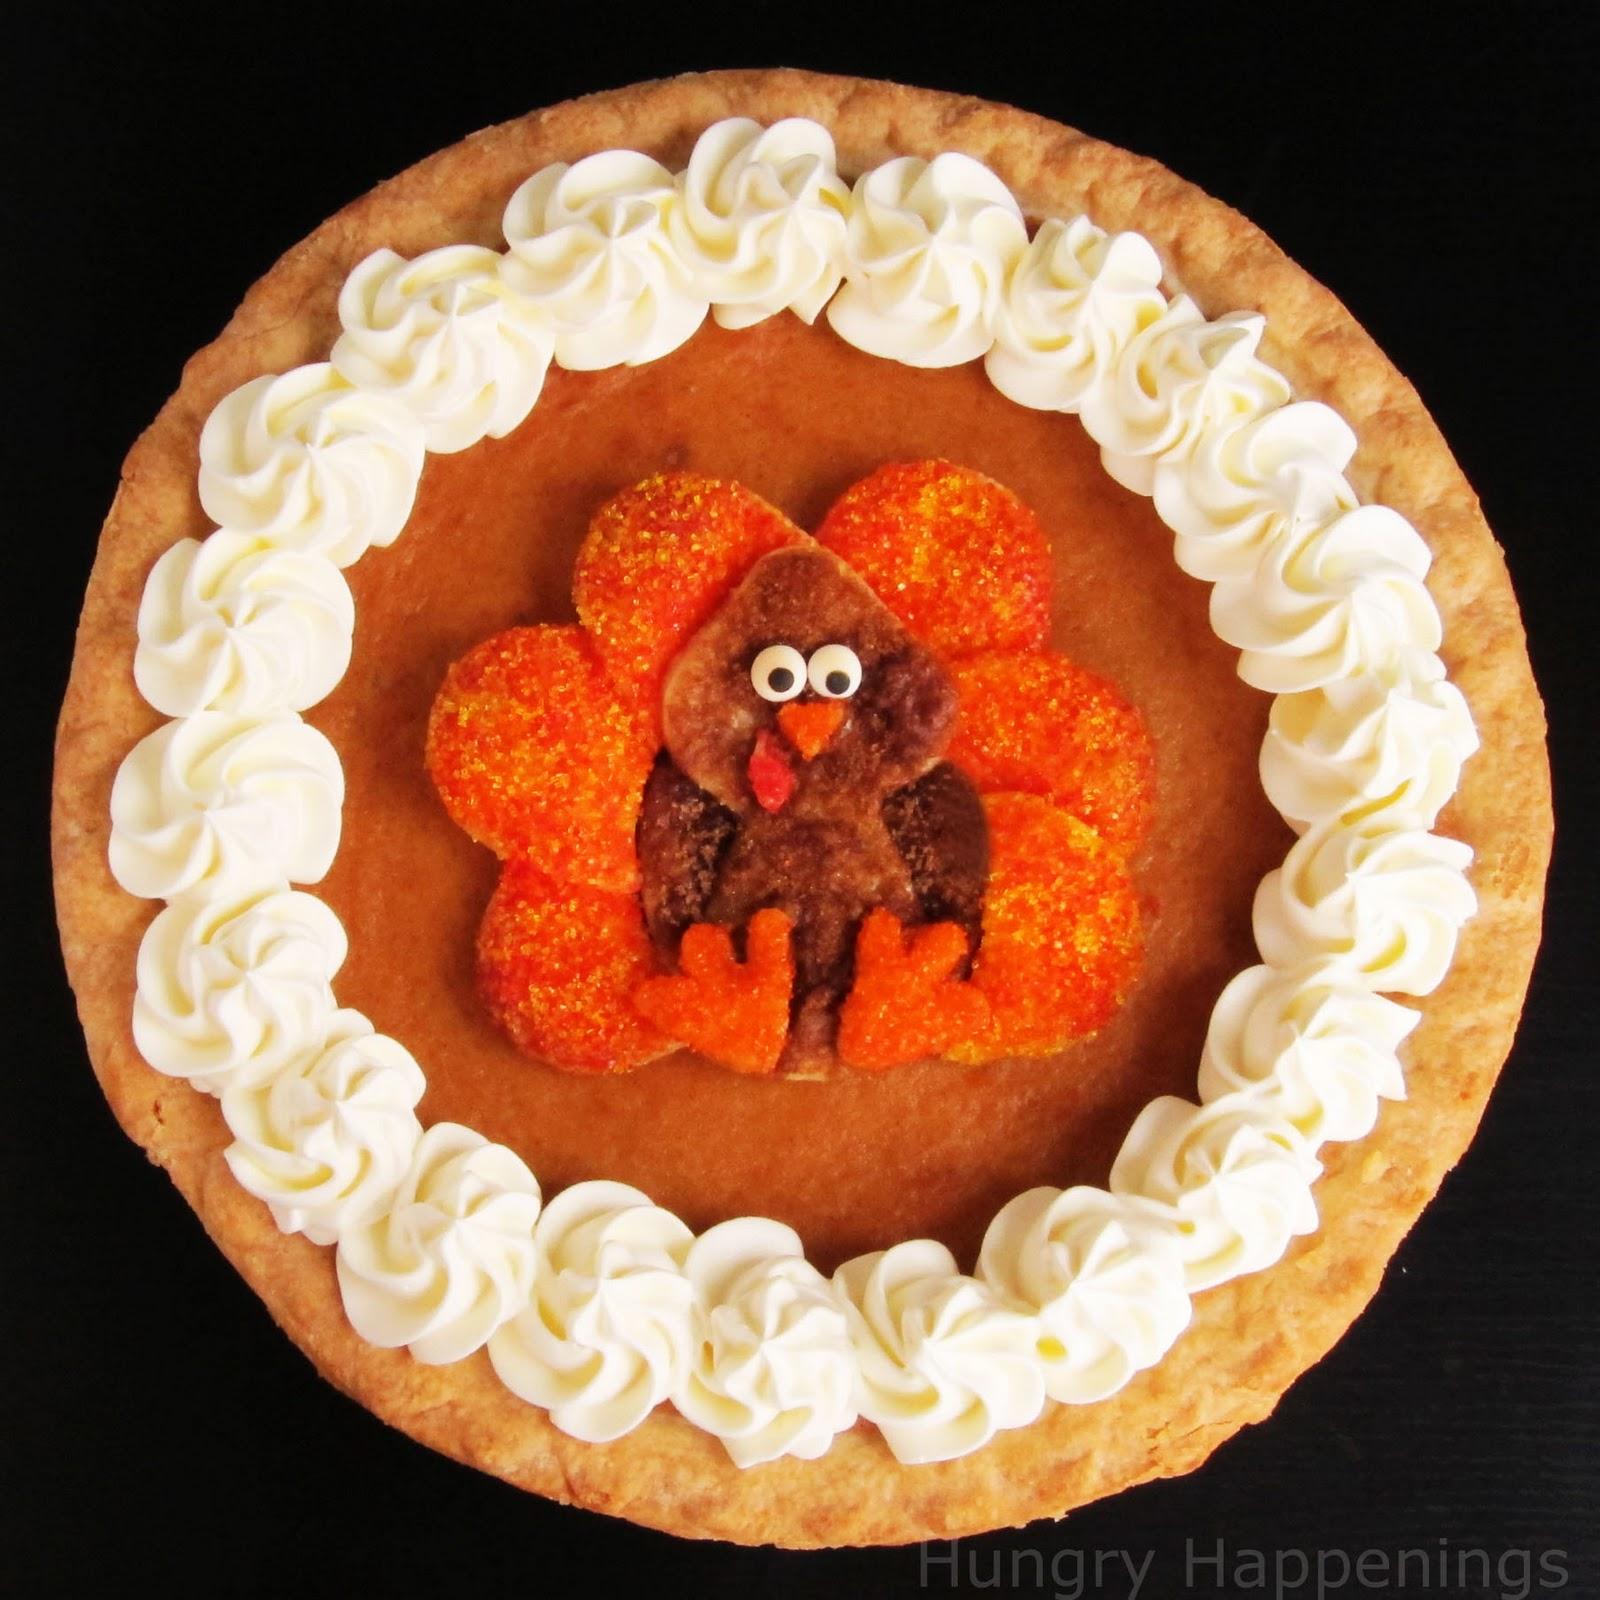 Decorated pumpkin pie festive thanksgiving dessert for How to decorate a pumpkin for thanksgiving